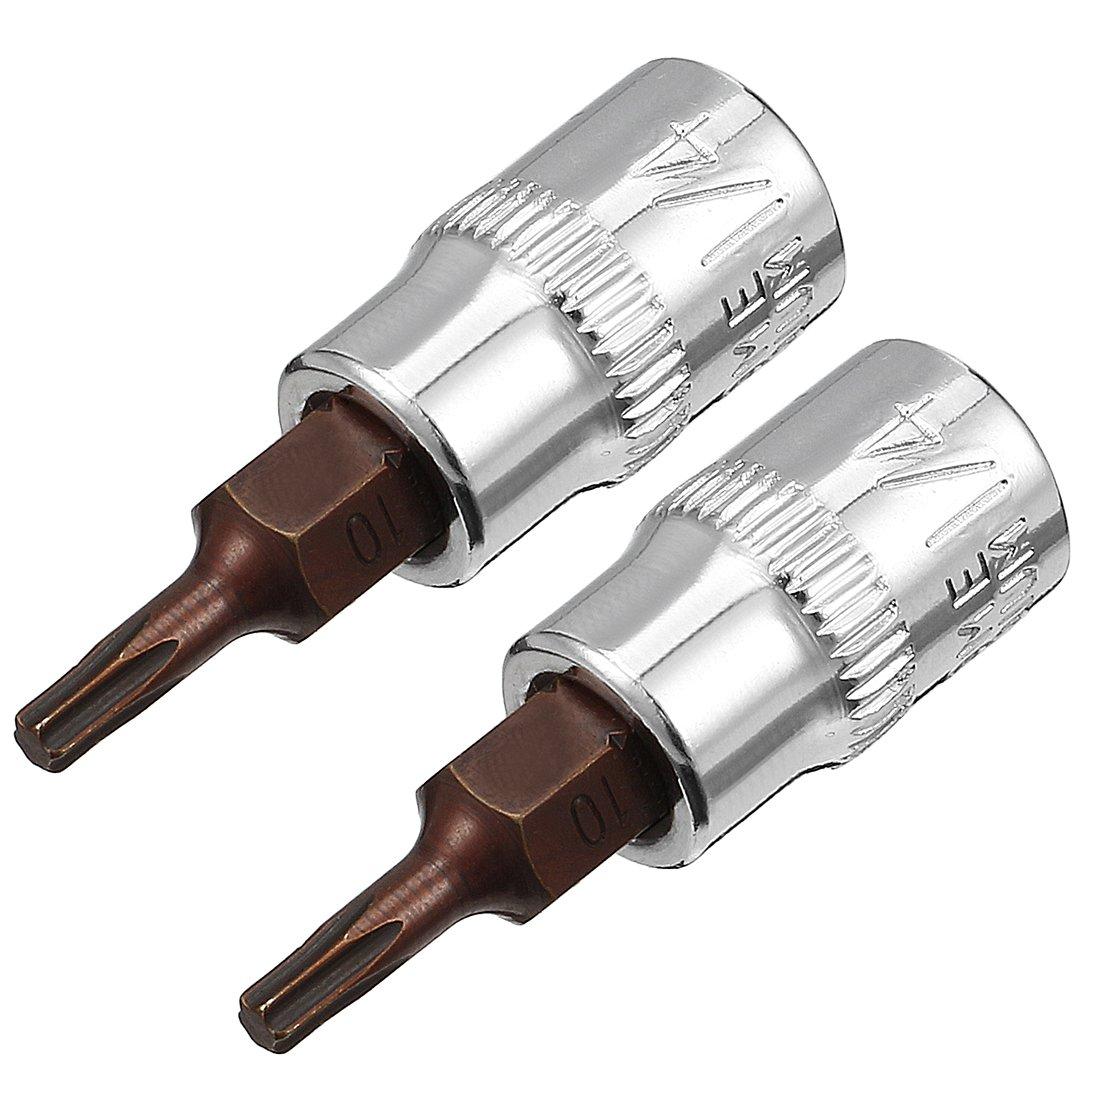 uxcell 3//8-Inch Drive Bit Socket Torx T20 S2 Steel 48mm Length 2 Pcs